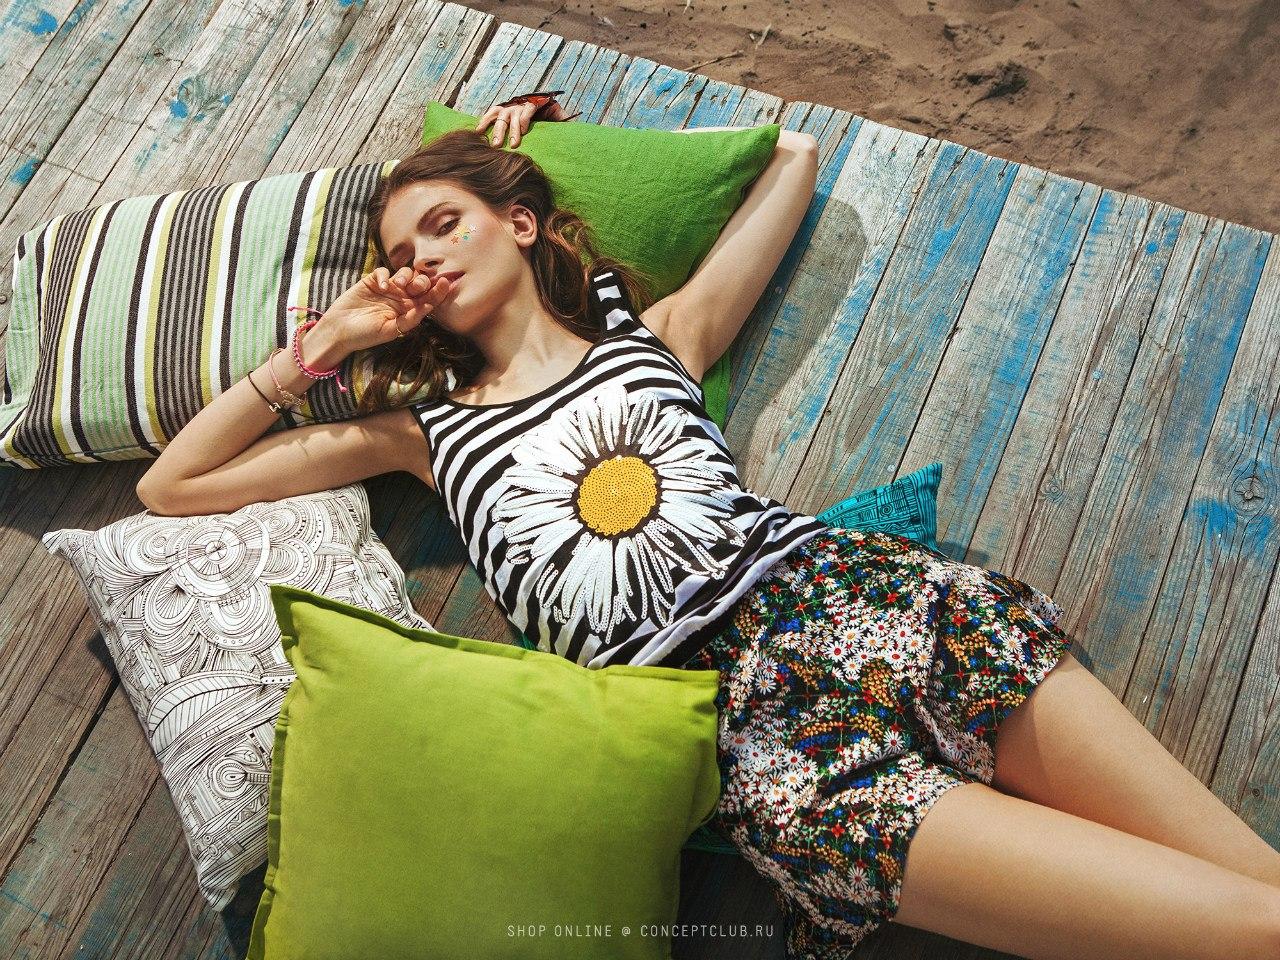 Concept Club Anna Grishina Evgenia Voronova